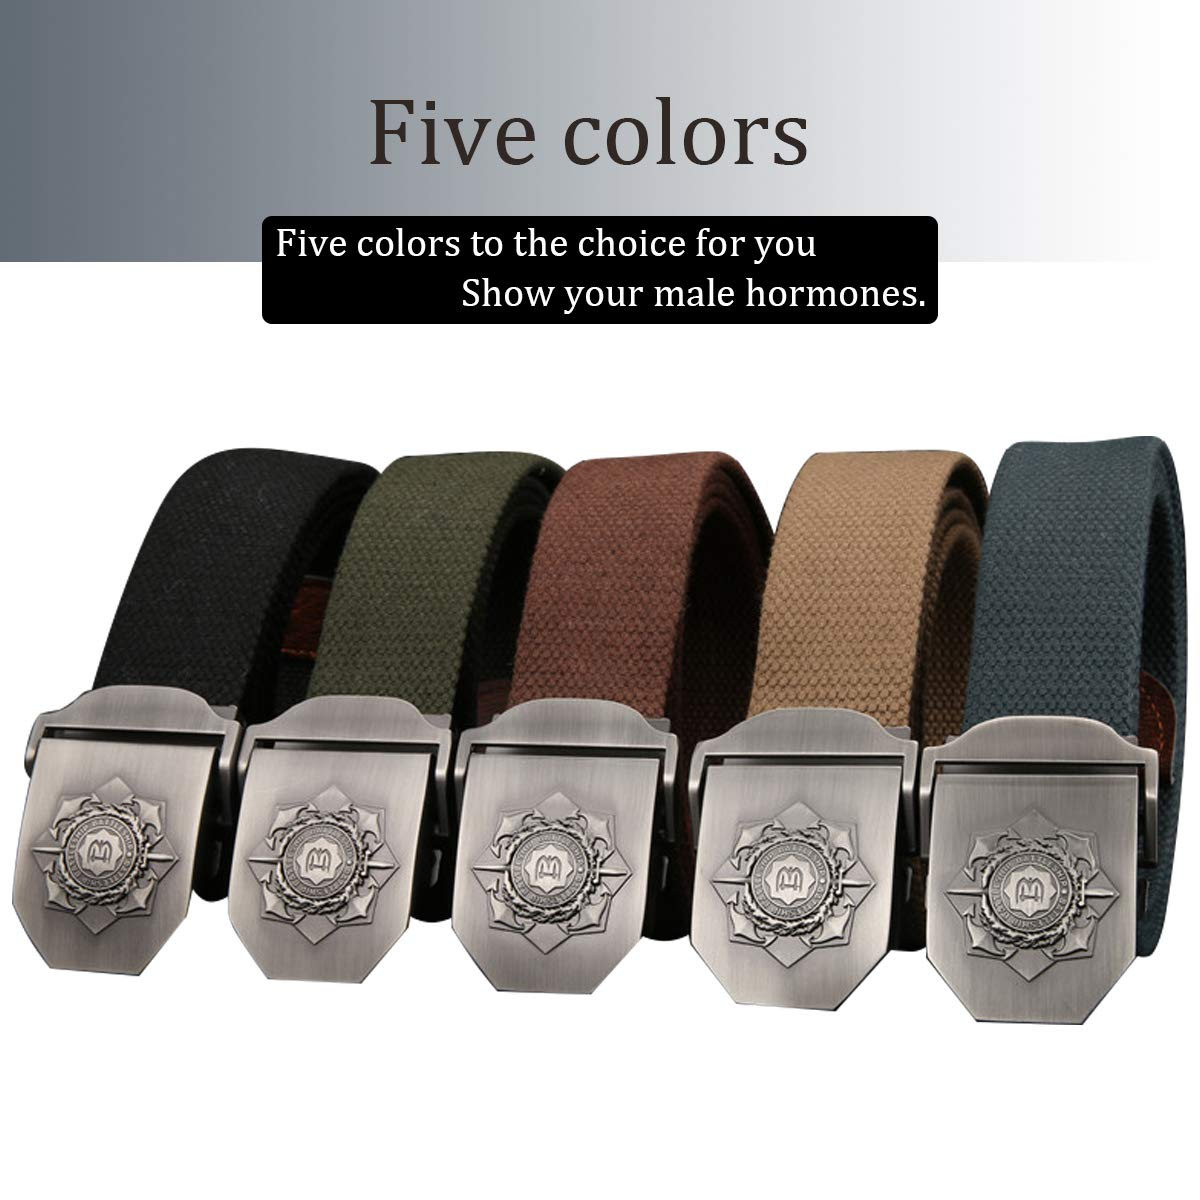 Youngate Canvas Web Belt Flip-Top Black Buckle//Tip Solid Color 53 Long 1.5 Wide